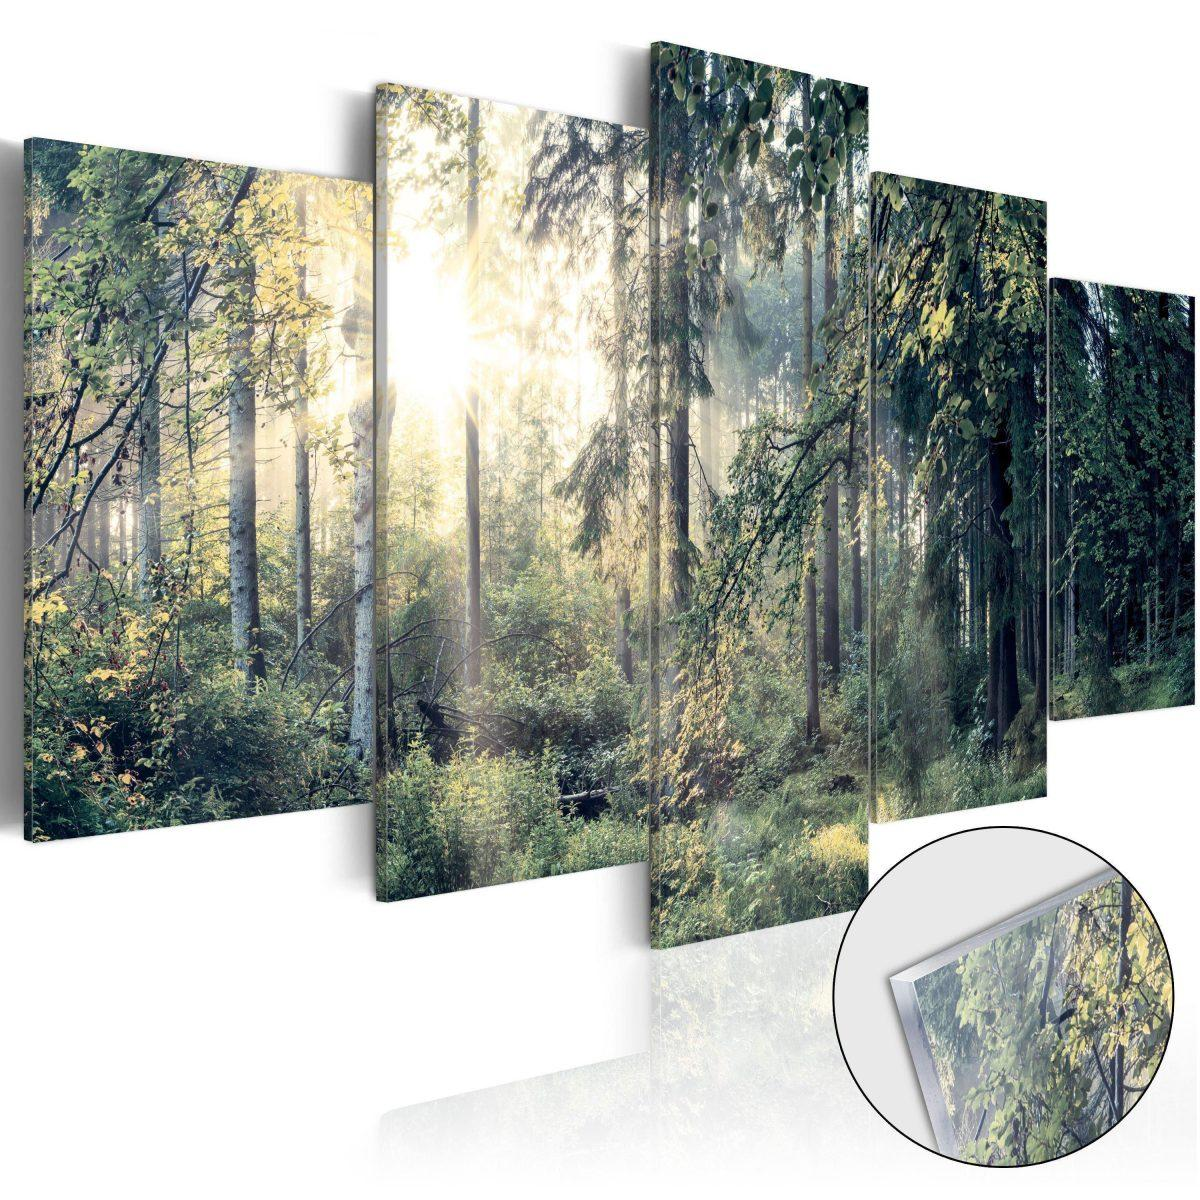 Tavla i akrylglas - Fairytale Landscape - 200x100